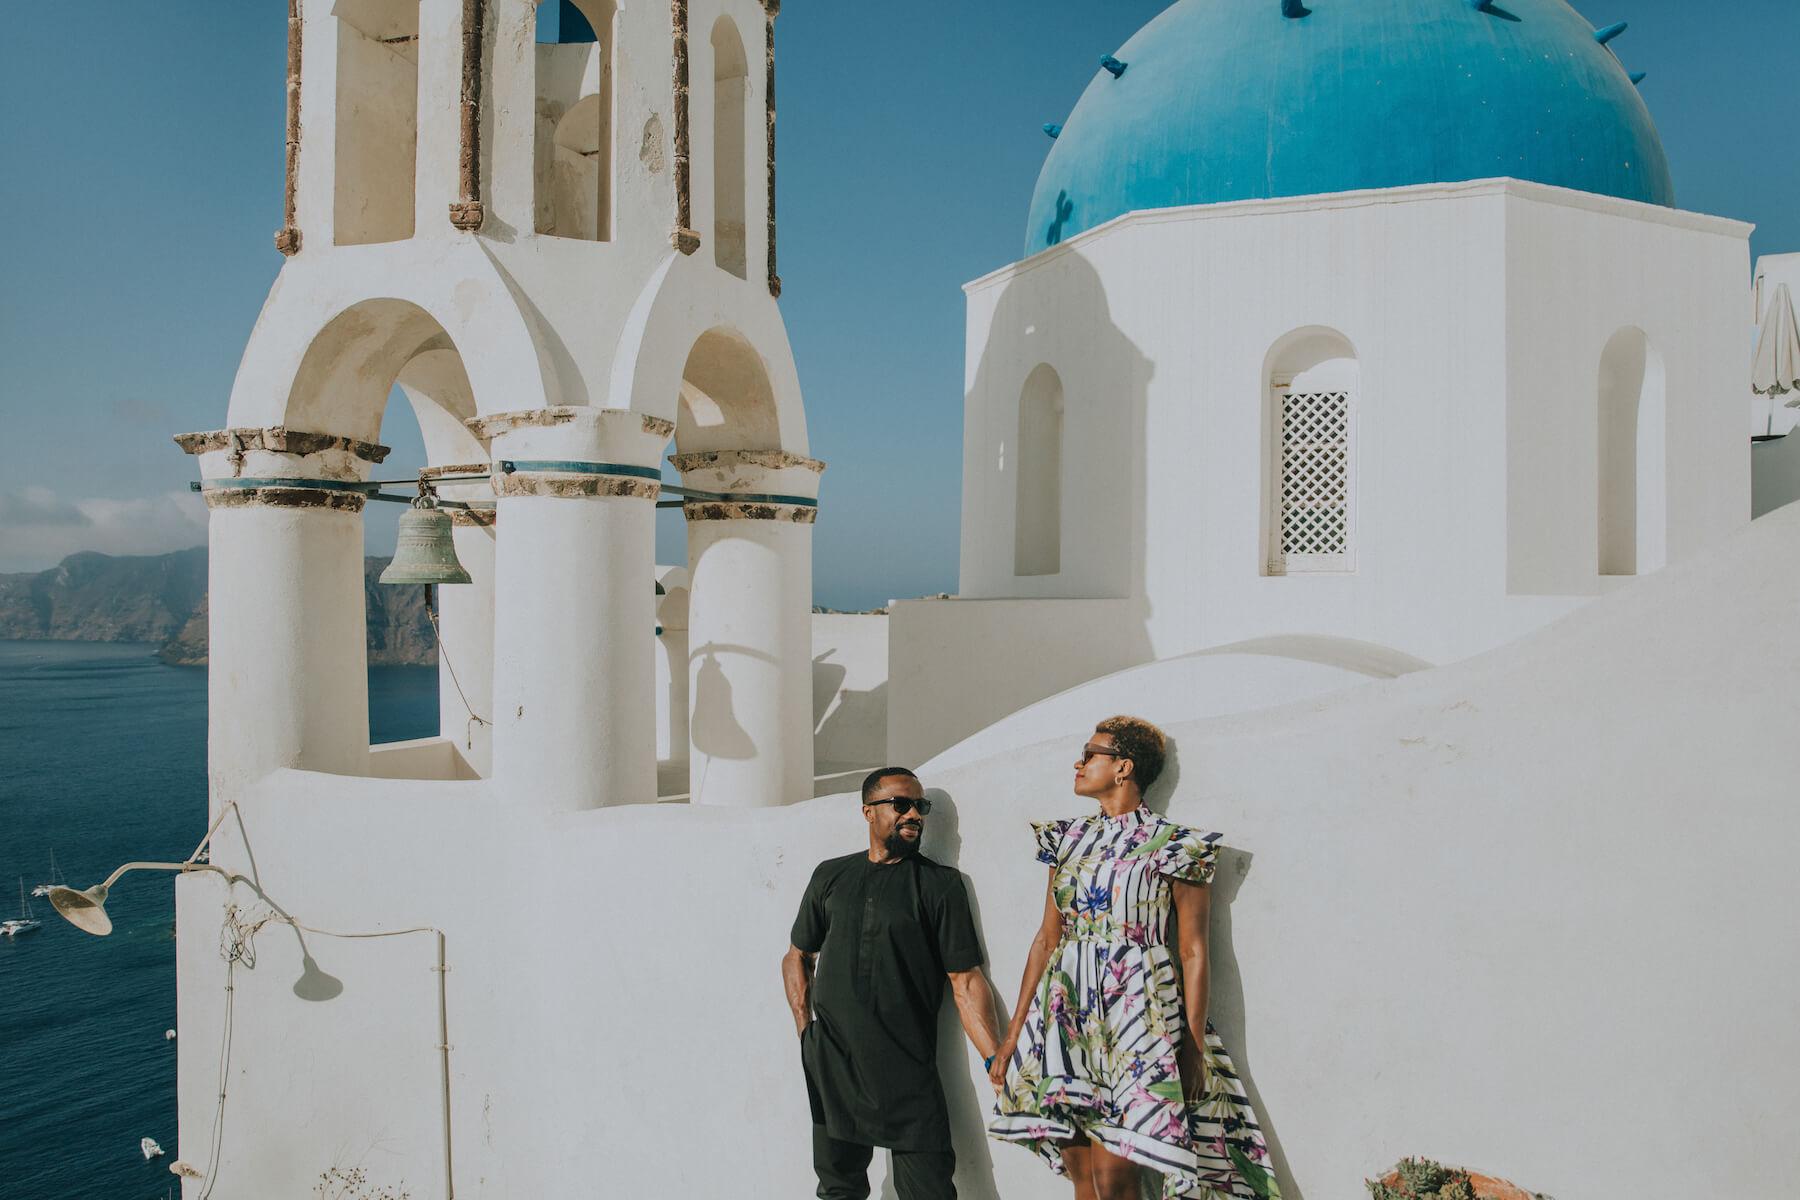 santorini-09-24-2019-couples-trip-11_original